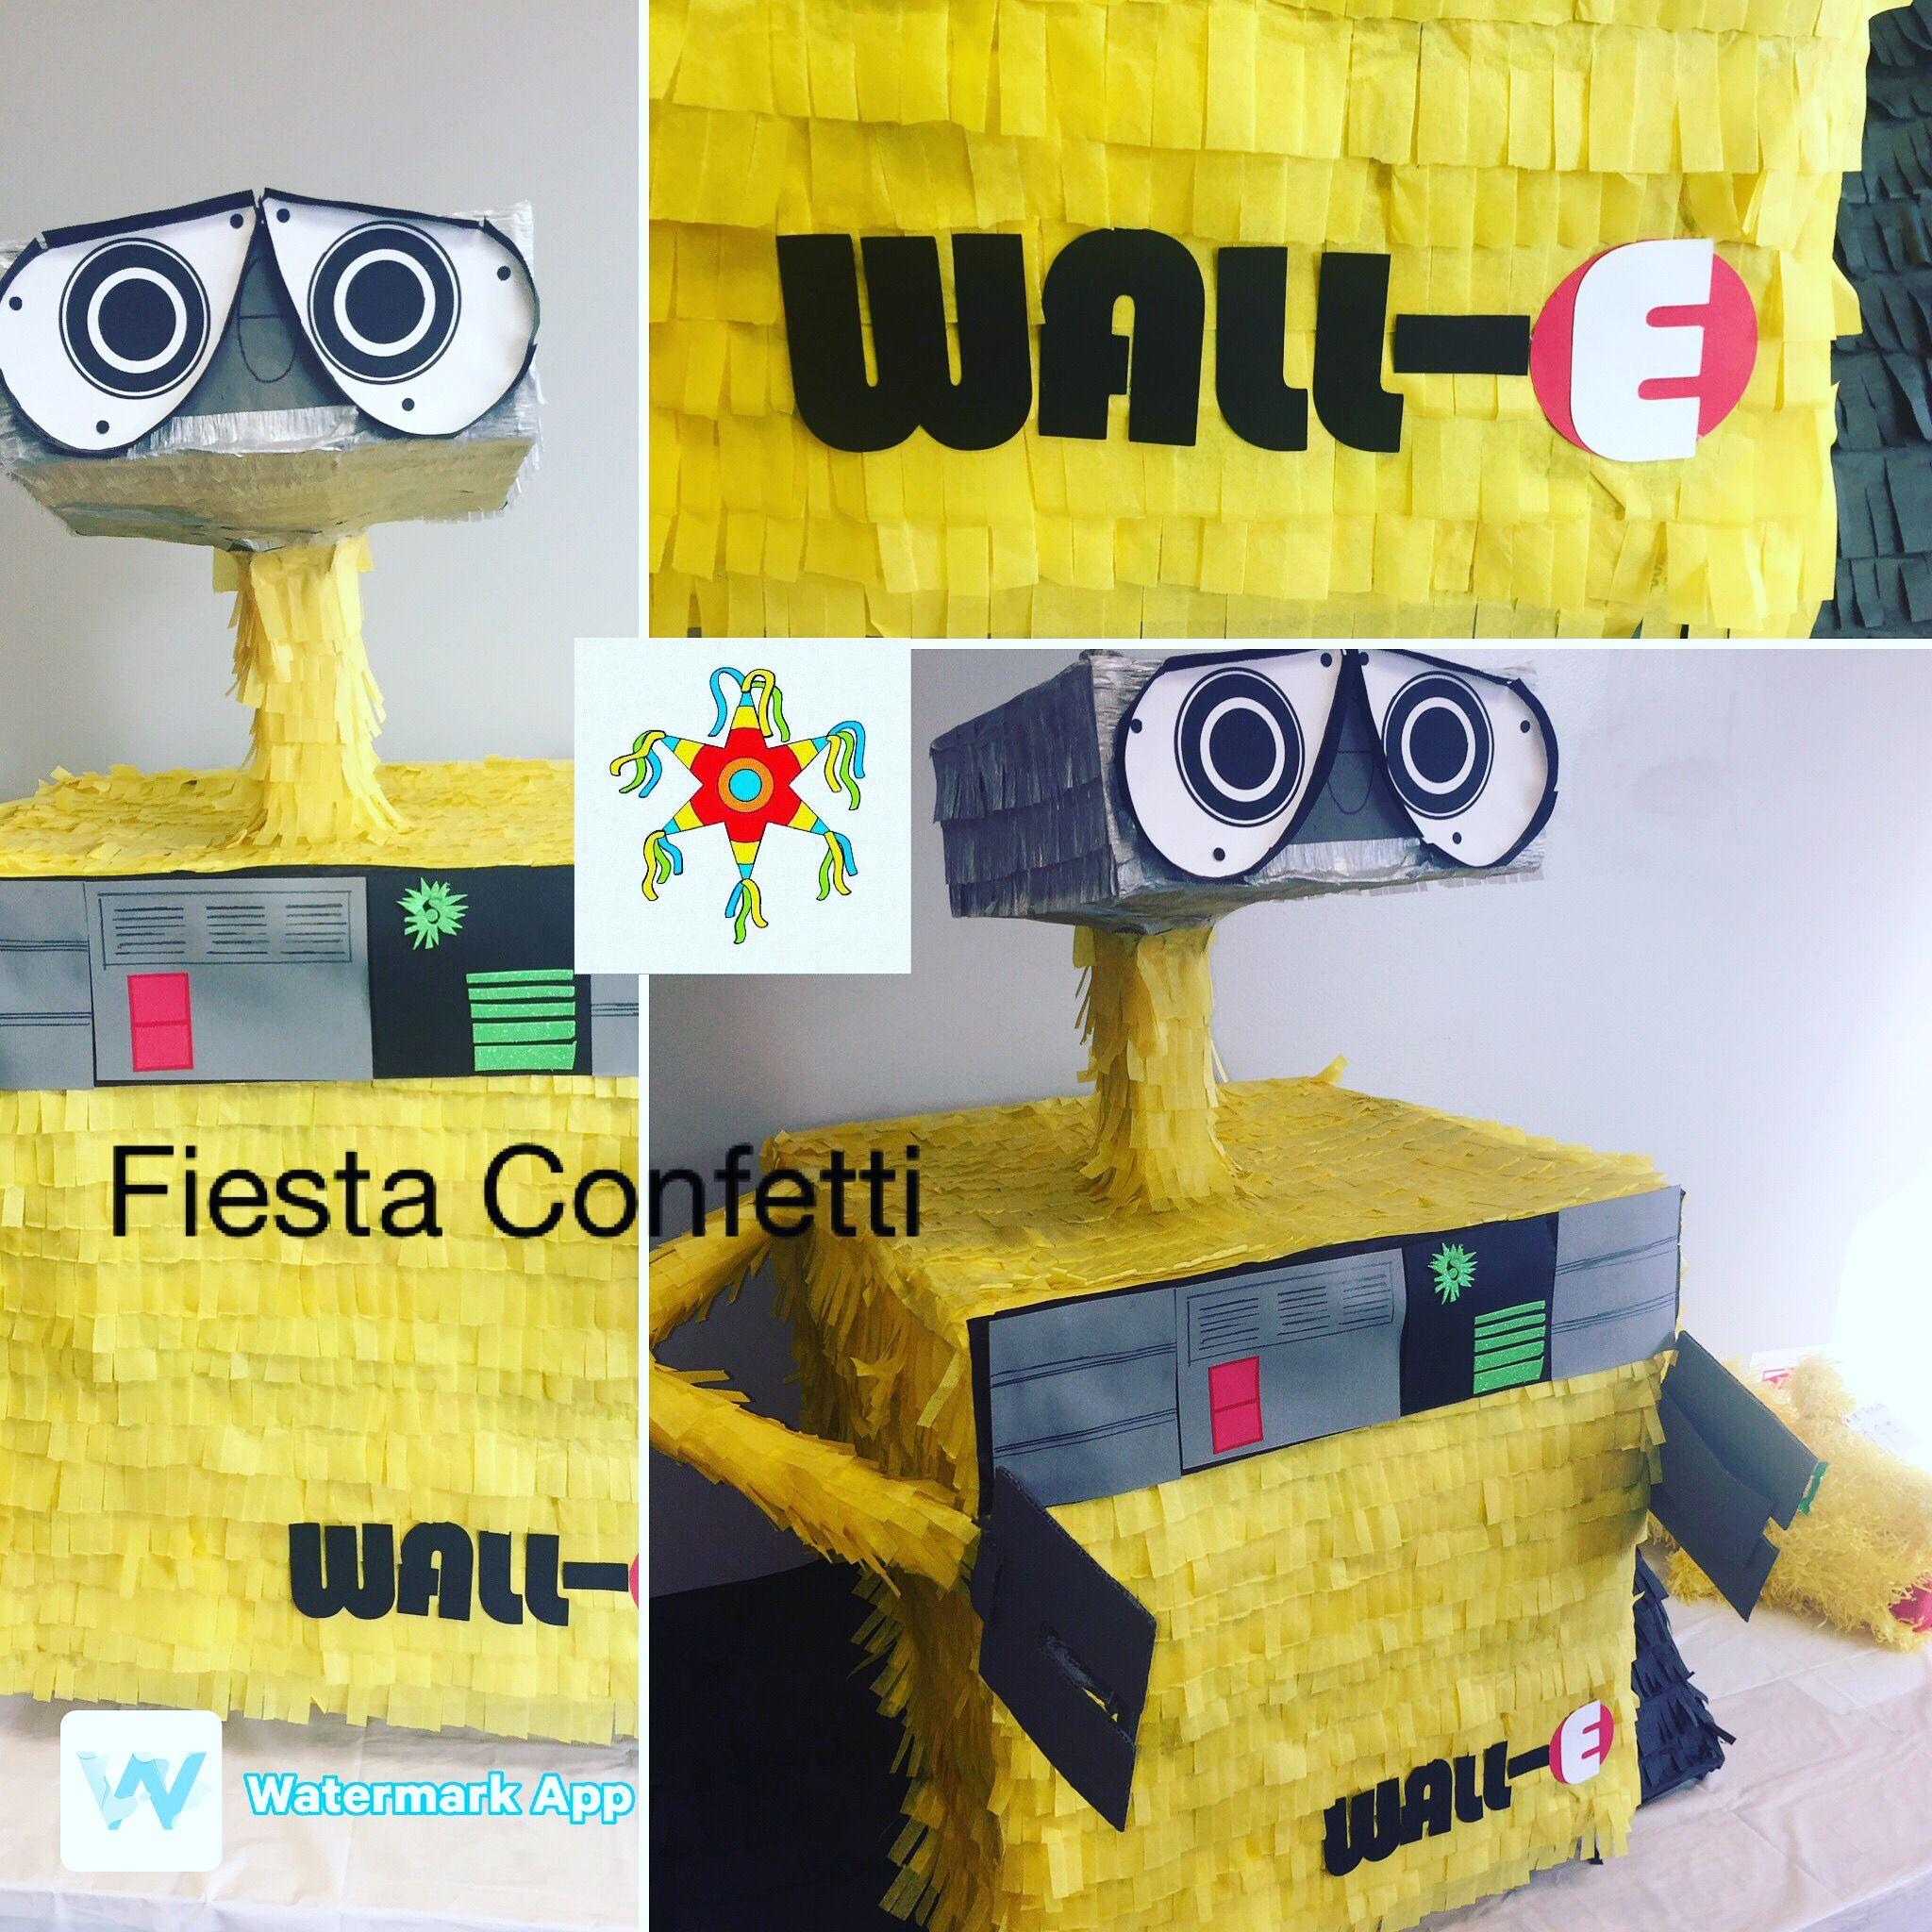 Wall-e piñata | Fiesta Confetti Party Store | Pinterest | Party stores